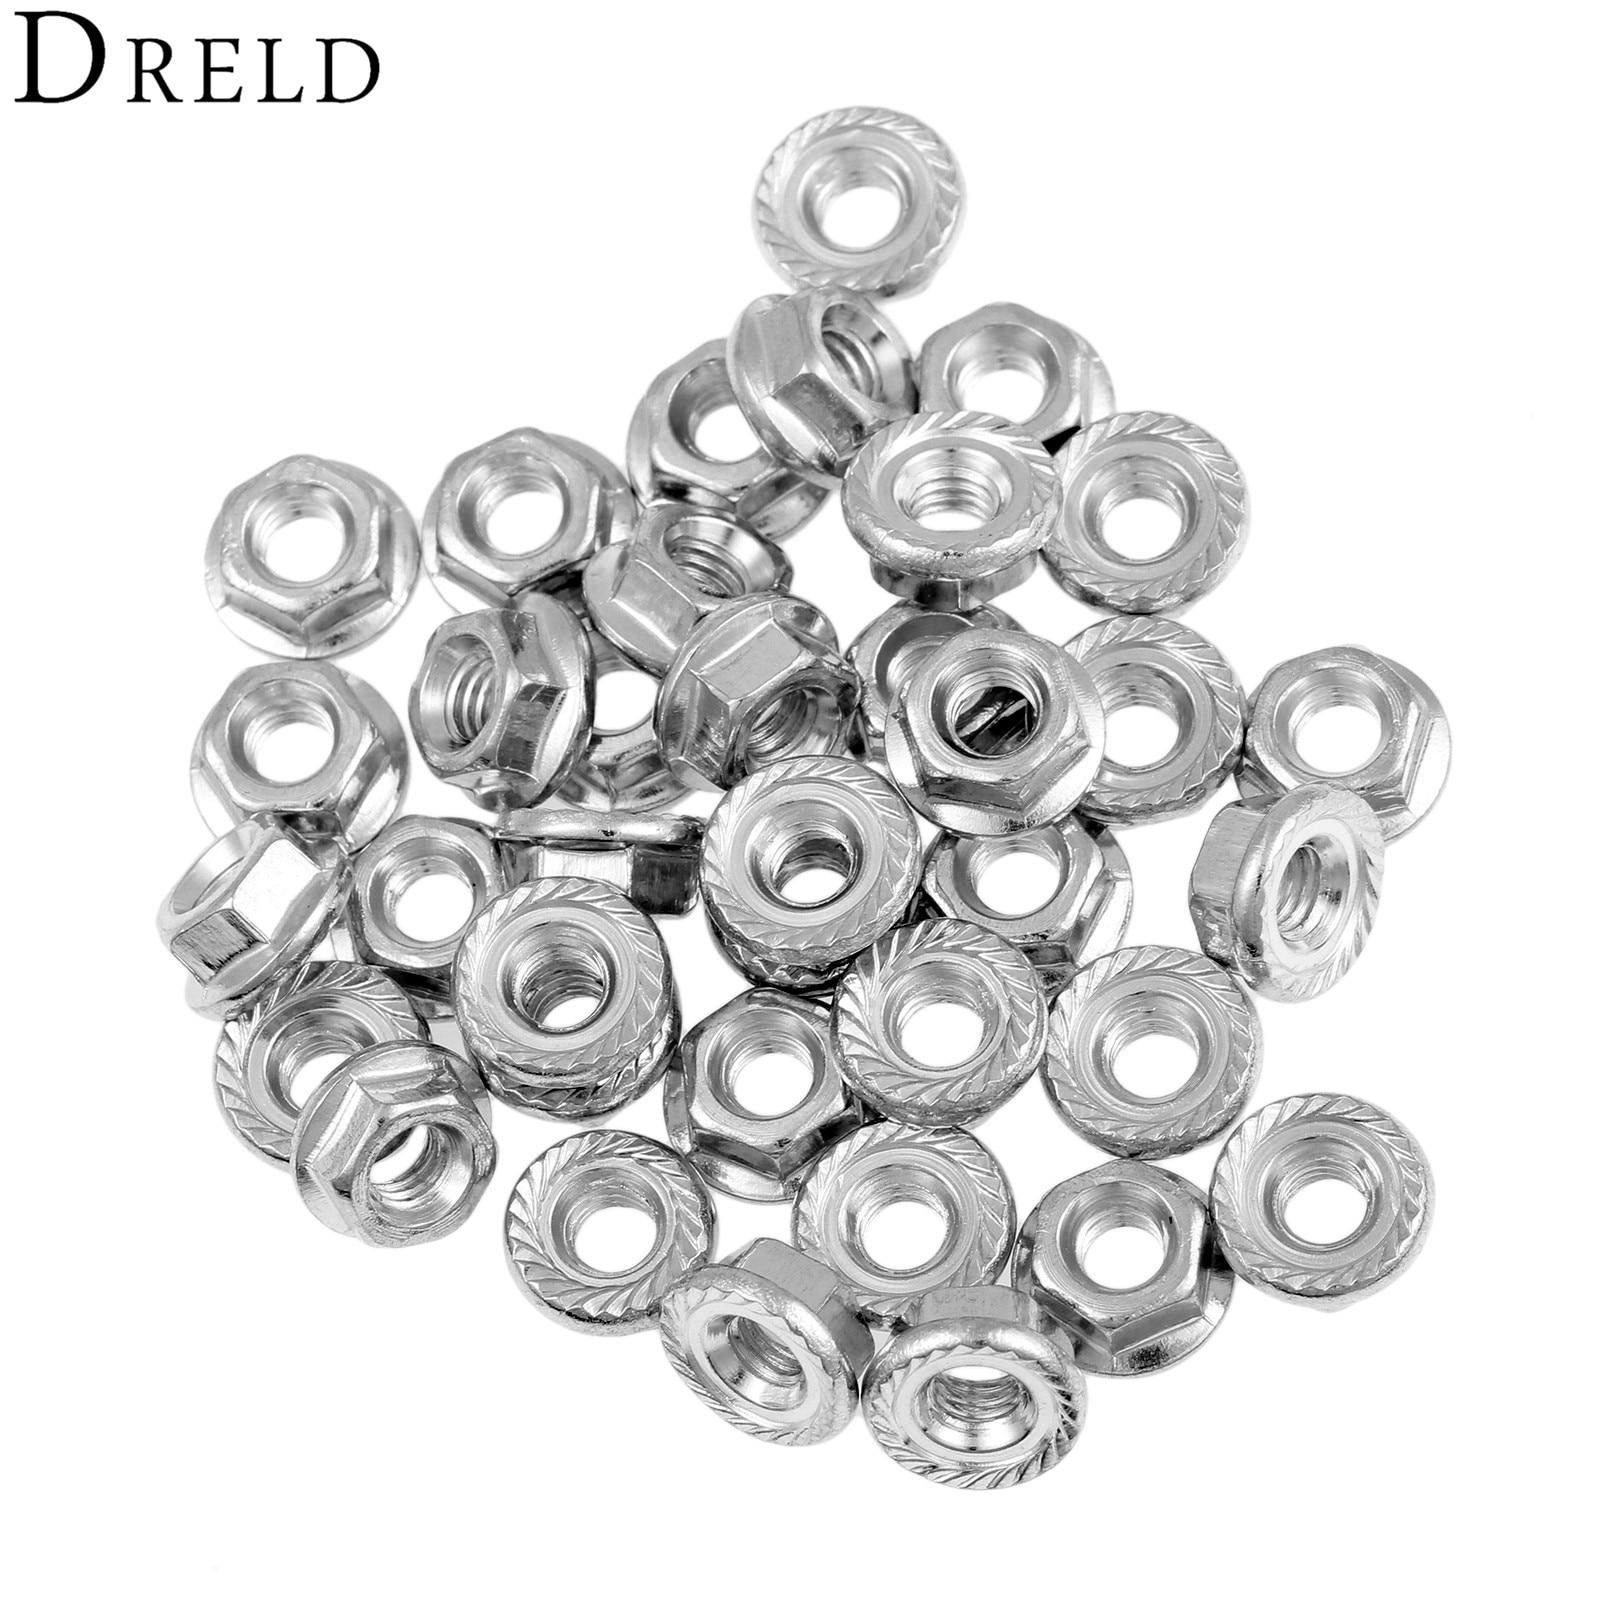 DRELD 50Pcs/lot Metric Thread M3 M4 M5 Carbon Steel Hex Flange Nut Hexagon Nut Lock Nut шорты женские love republic цвет черный 8254145704 50 размер 42